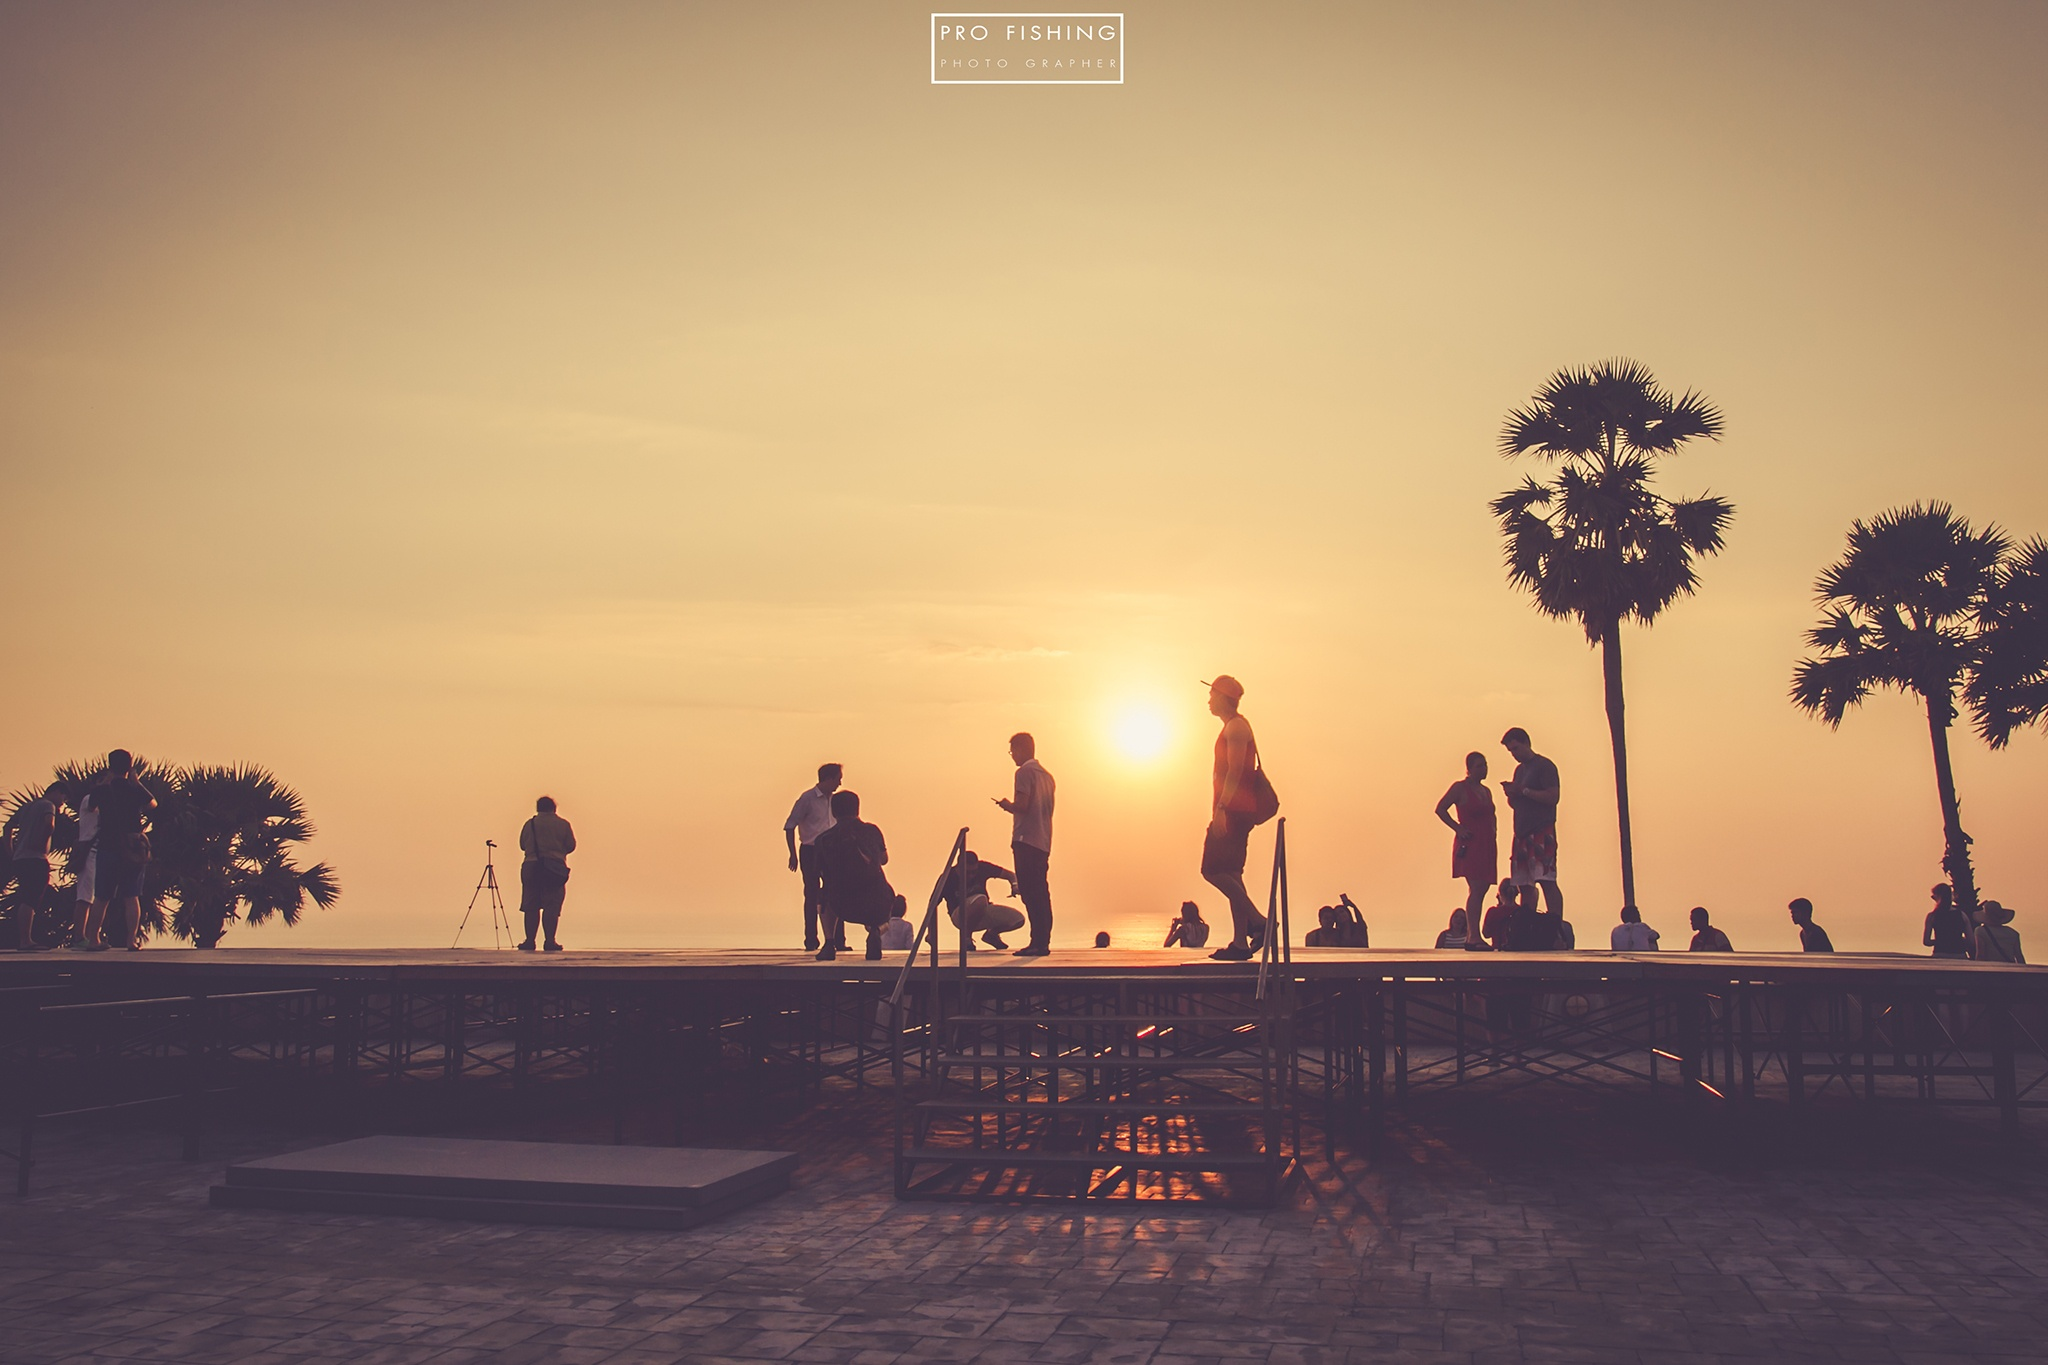 Sunset time by Phuketlocalphotographer